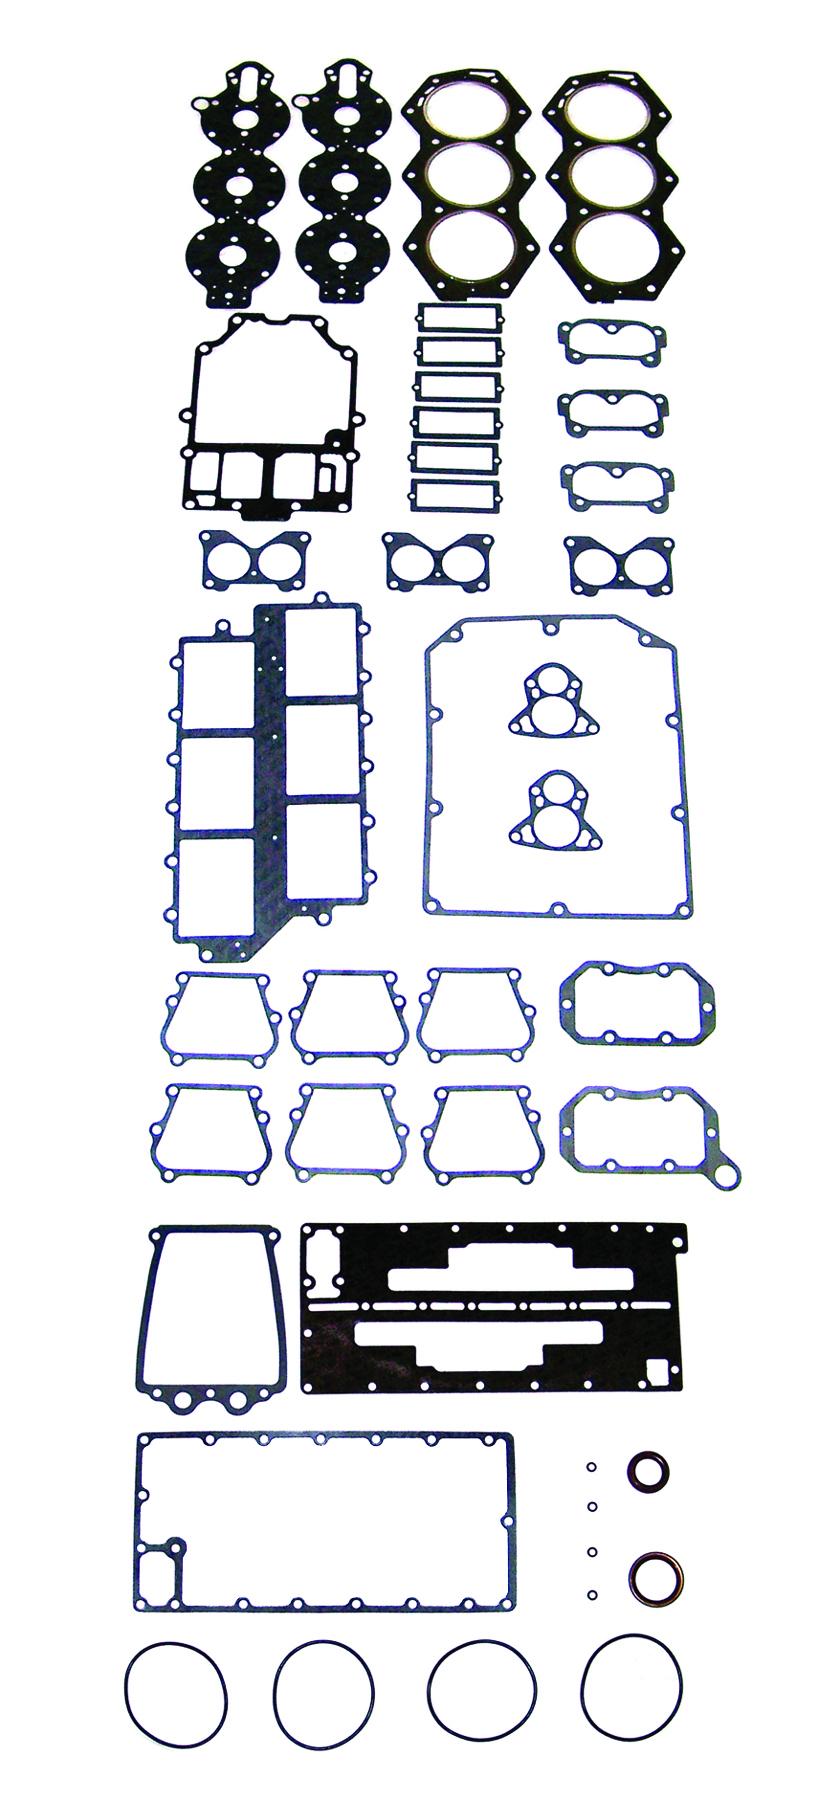 New Johnson/Evinrude 175/235 HP Crossflow 6-CYL Powerhead